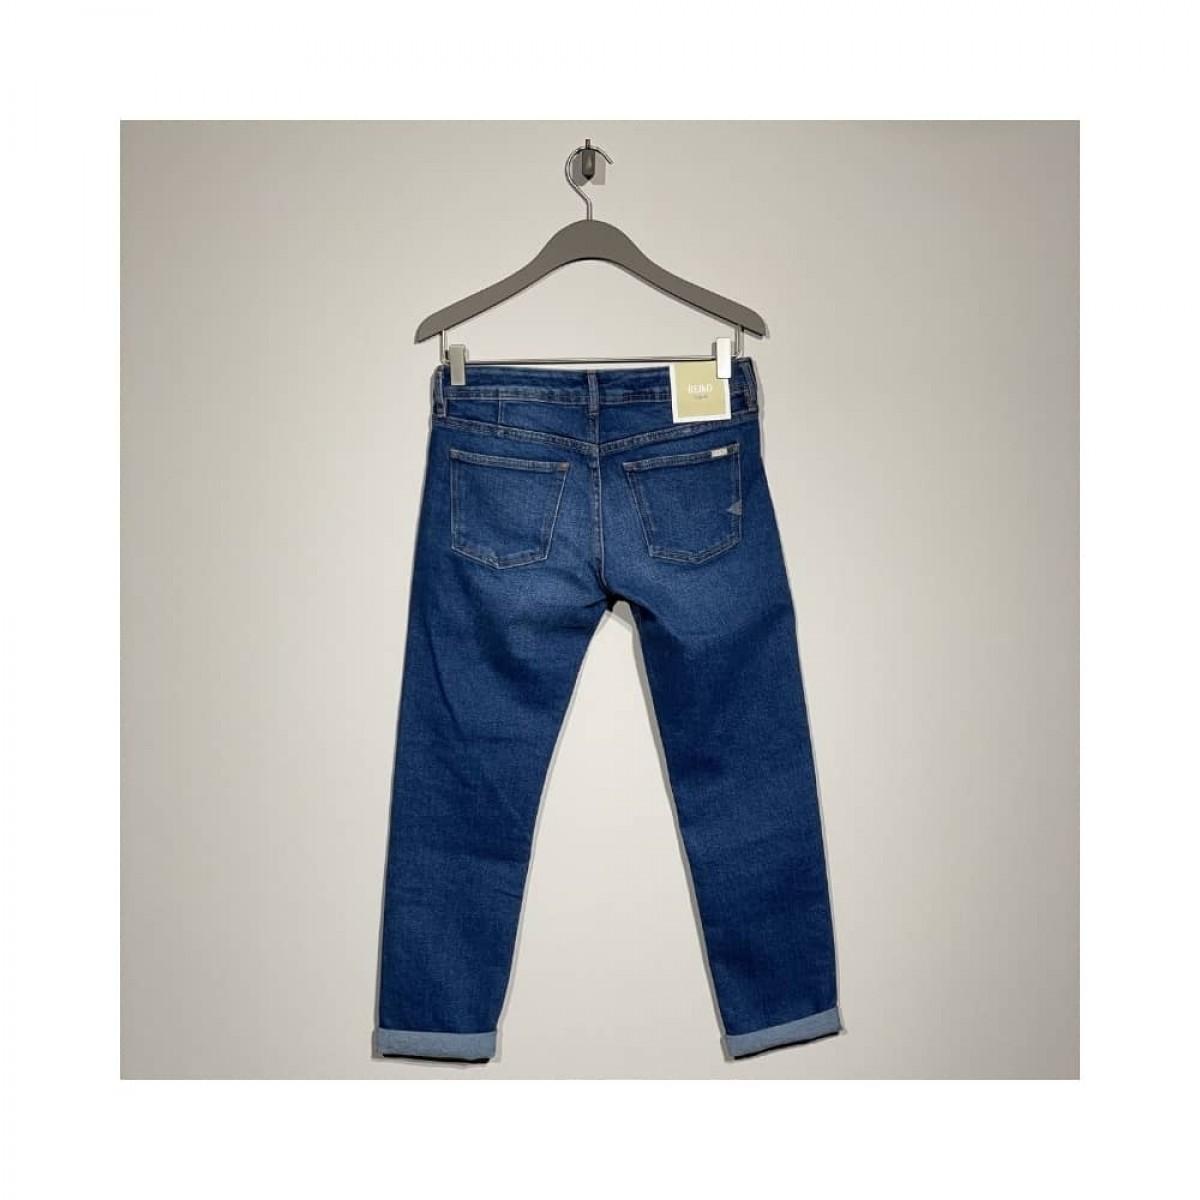 nina boyfriend jeans - blue - bag